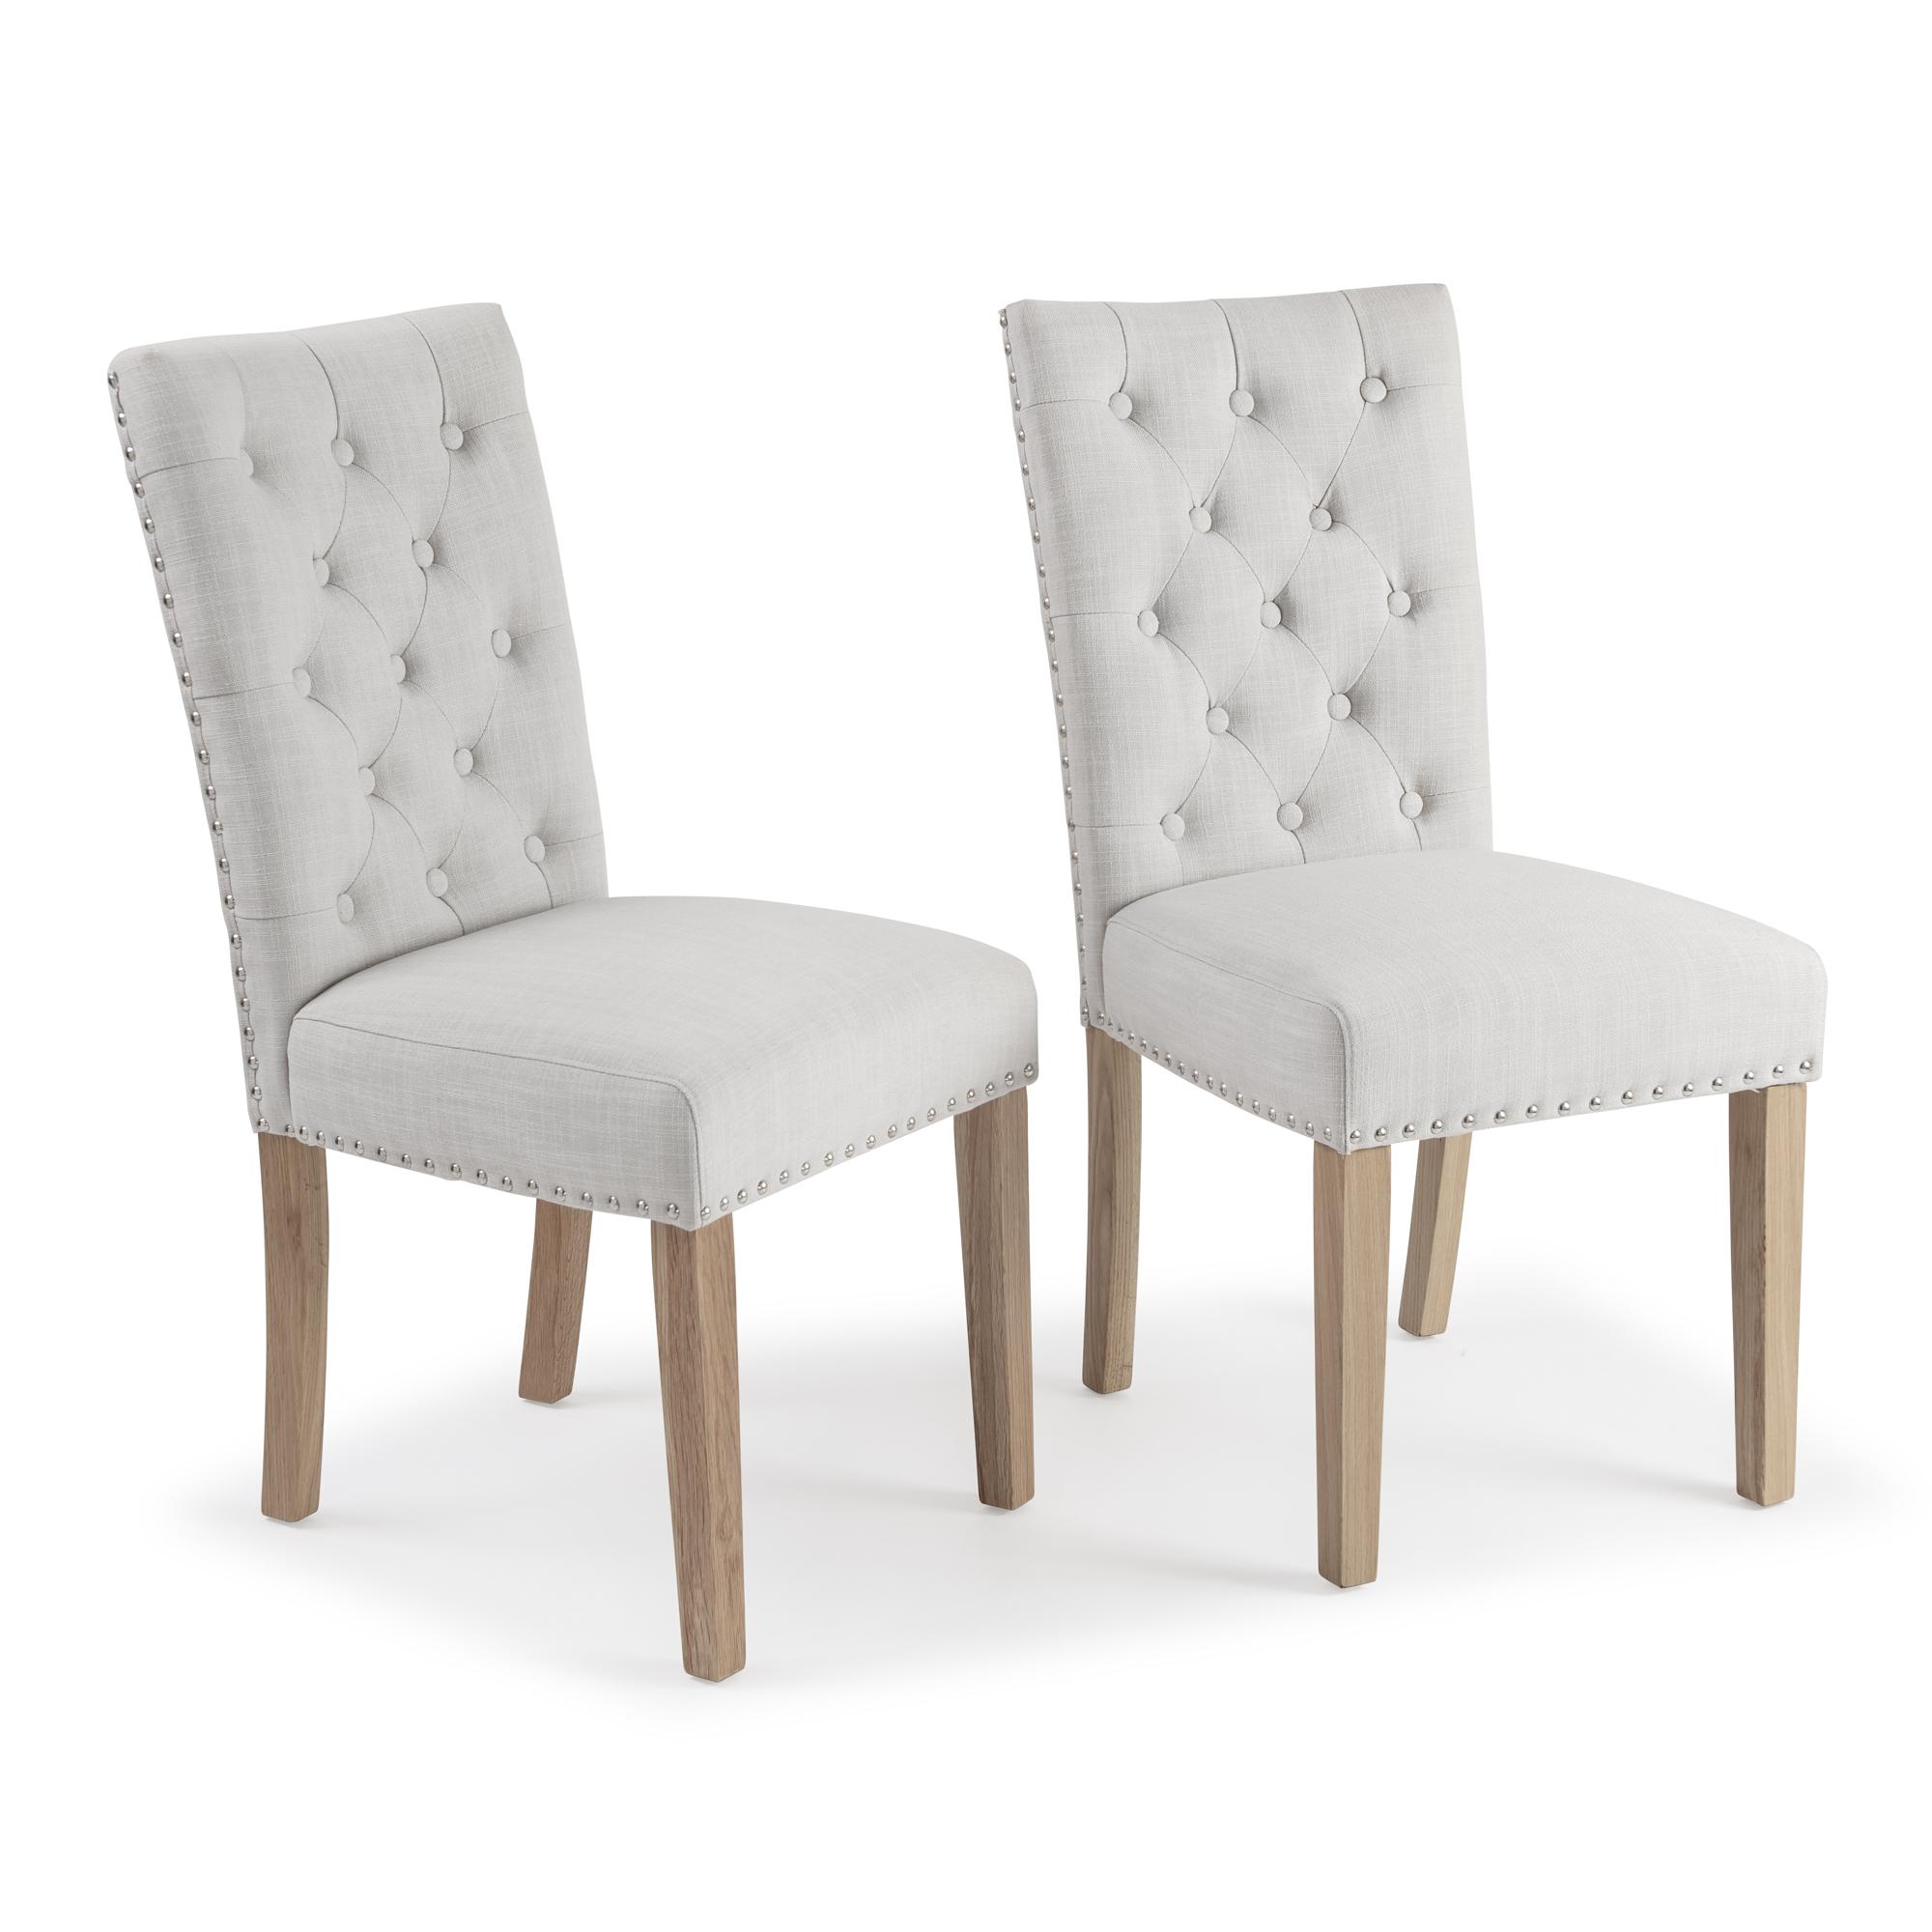 Harrogate Cream Natural Linen Dining Chairs Set Of 2